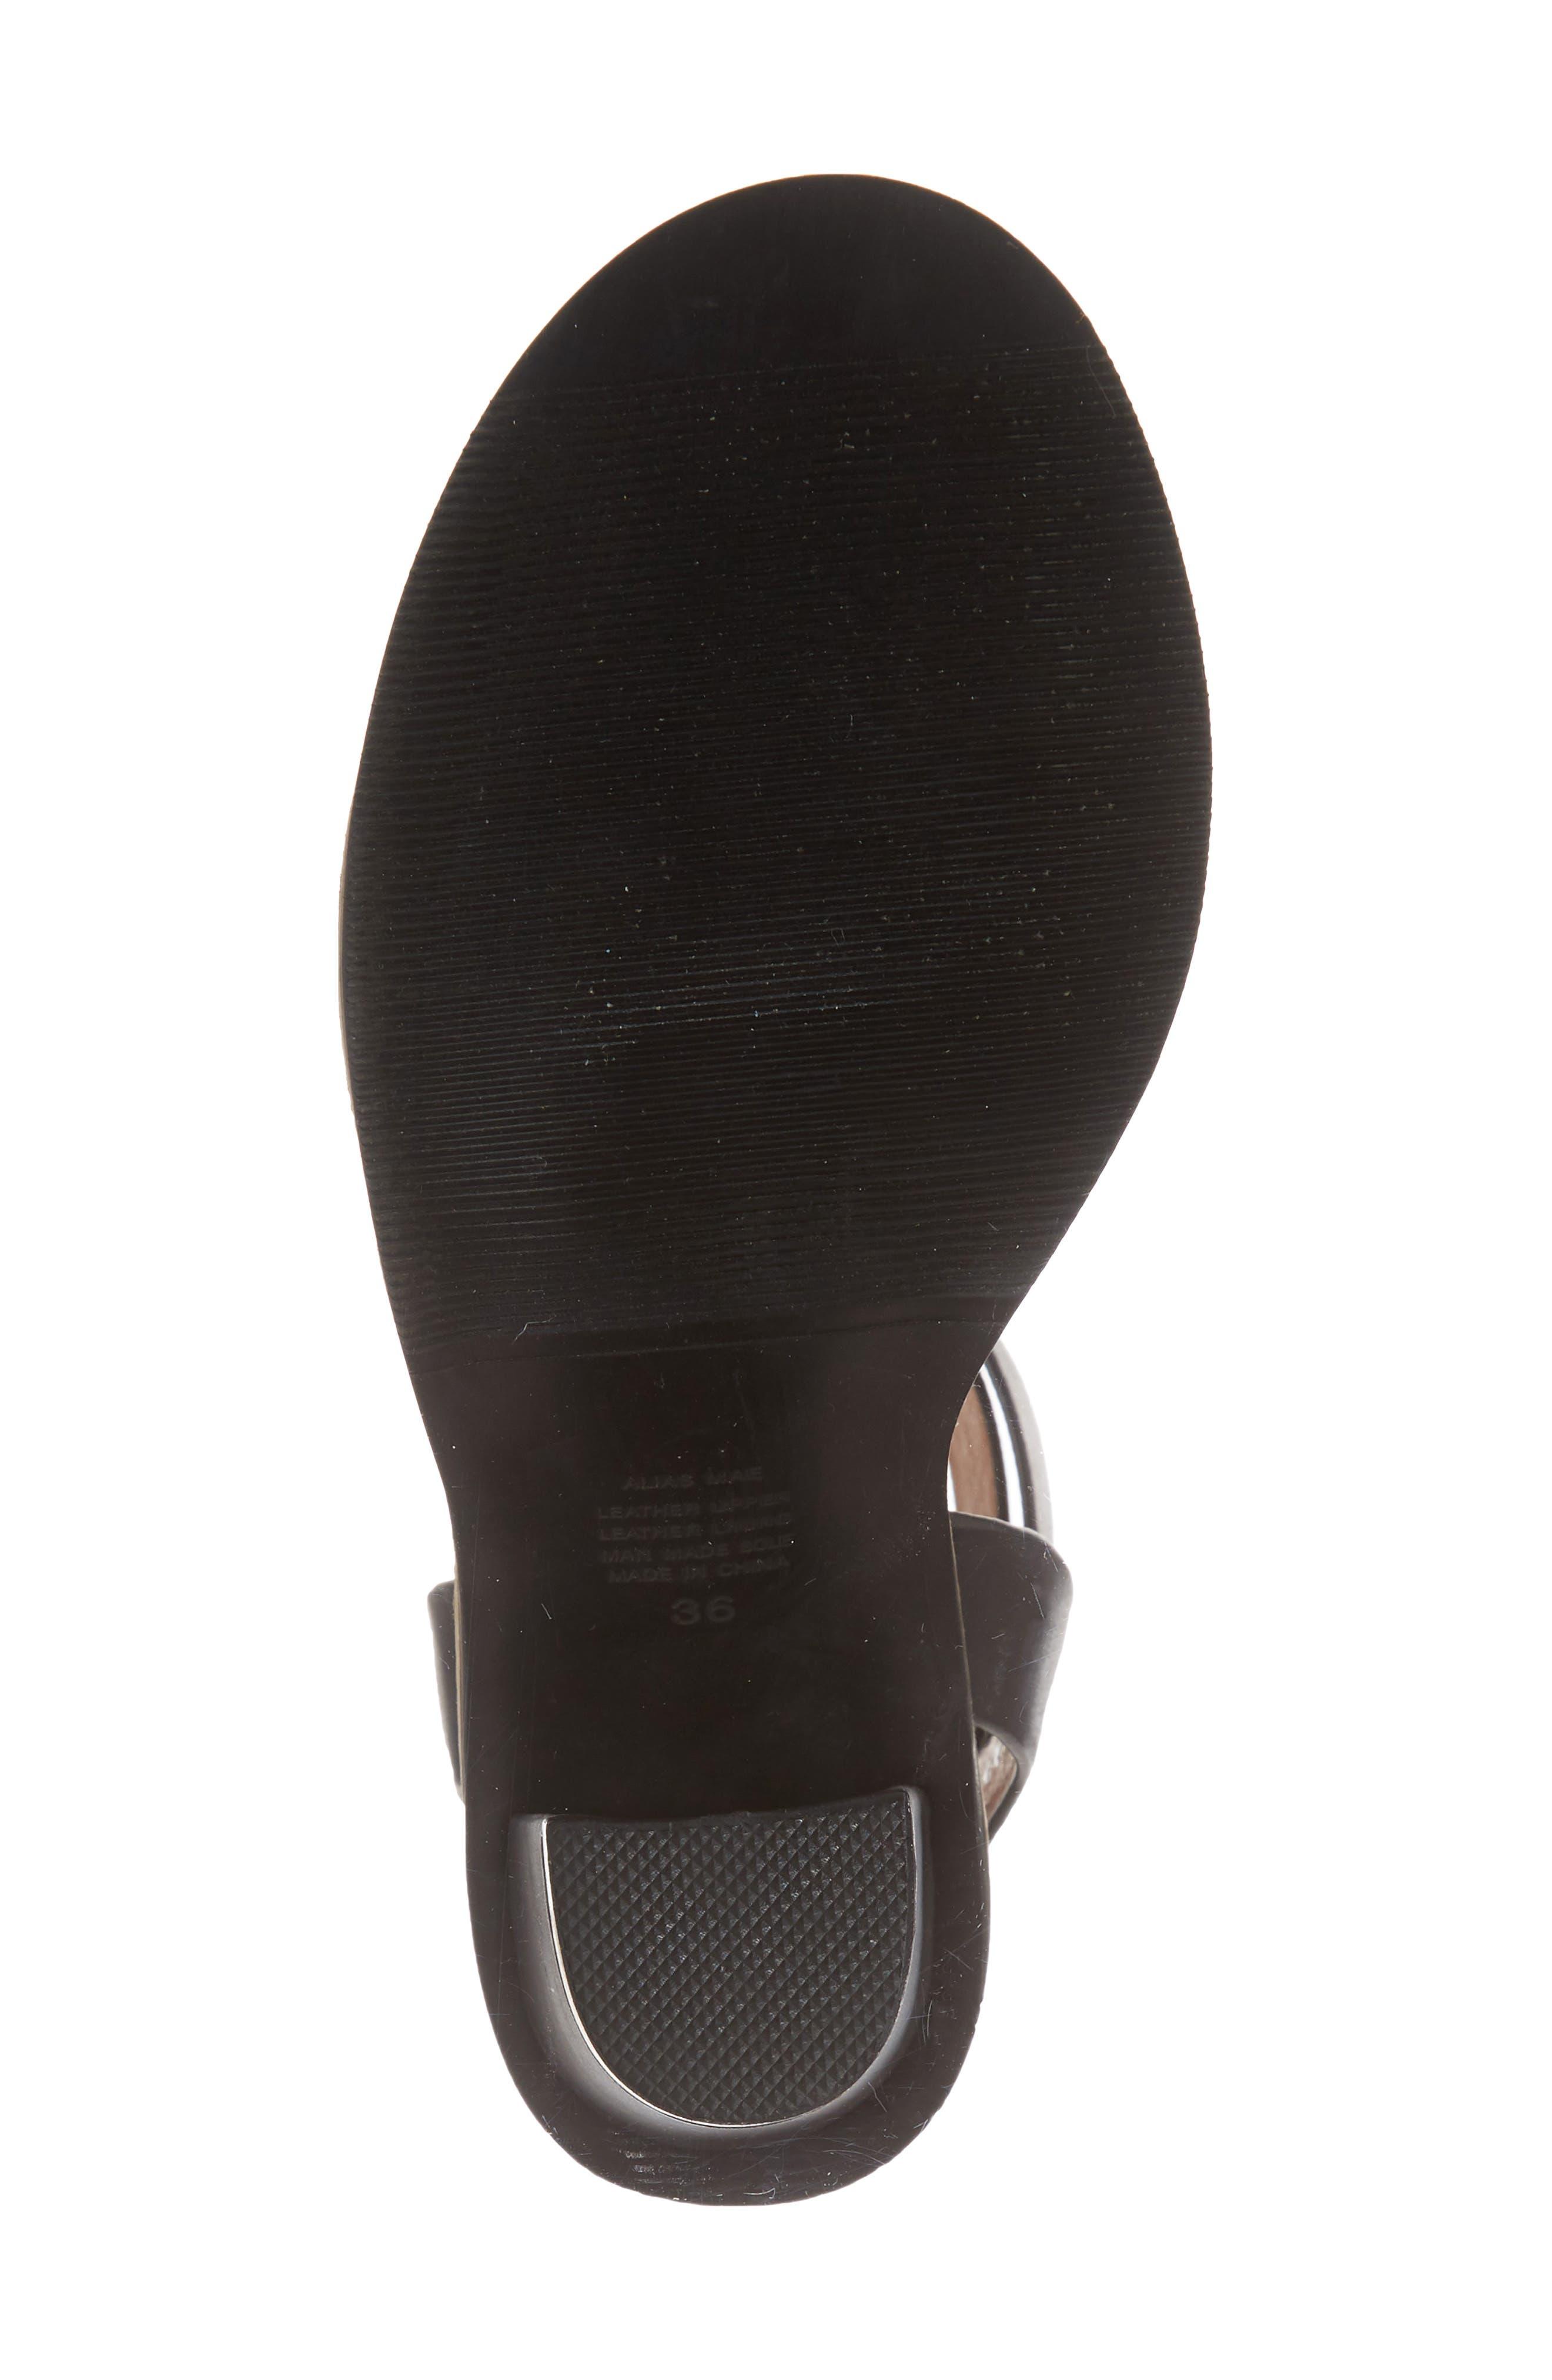 Calito Ankle Strap Sandal,                             Alternate thumbnail 6, color,                             001